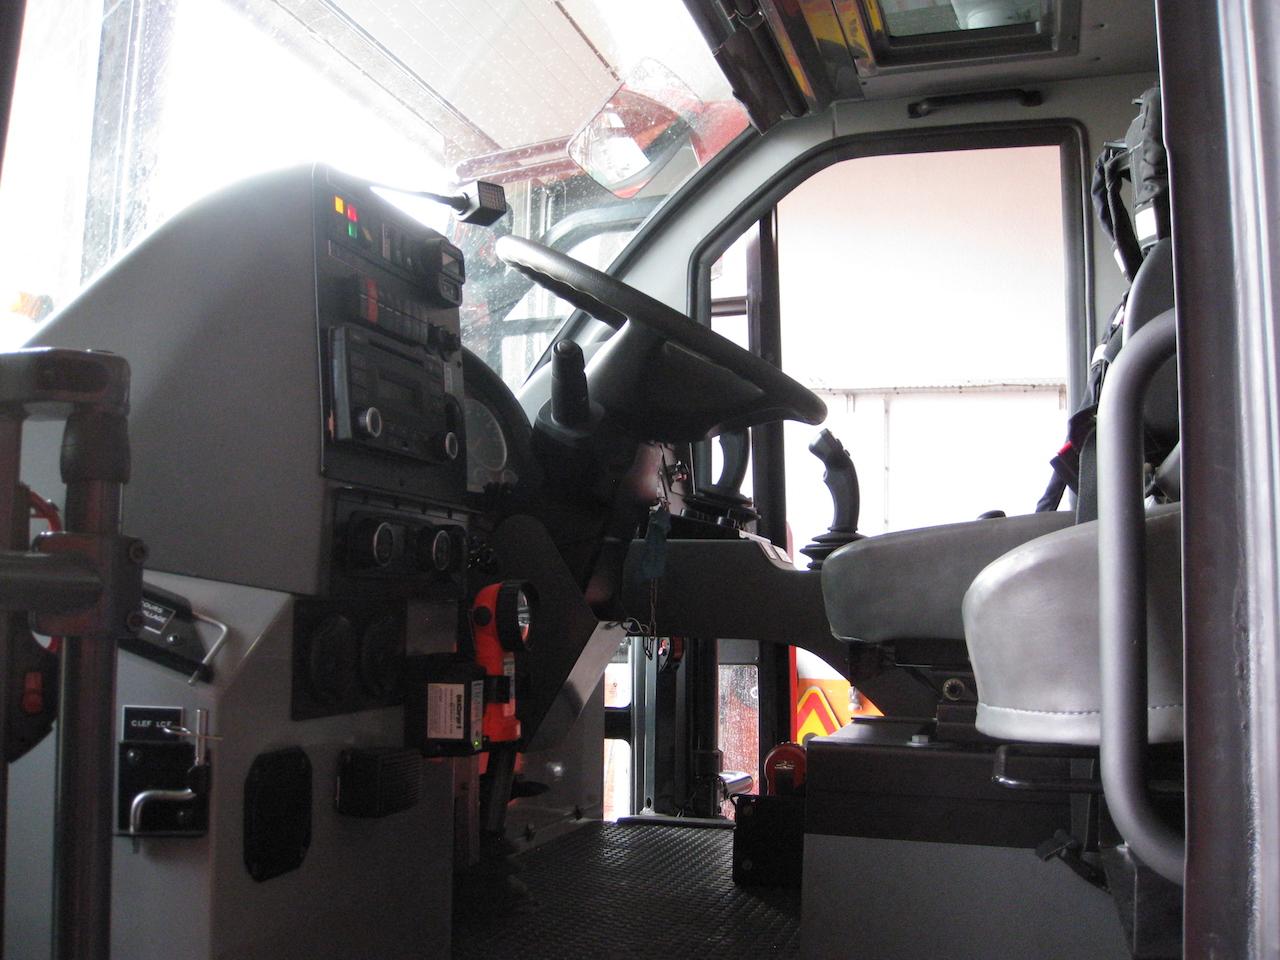 Mirage Vette 2012 10